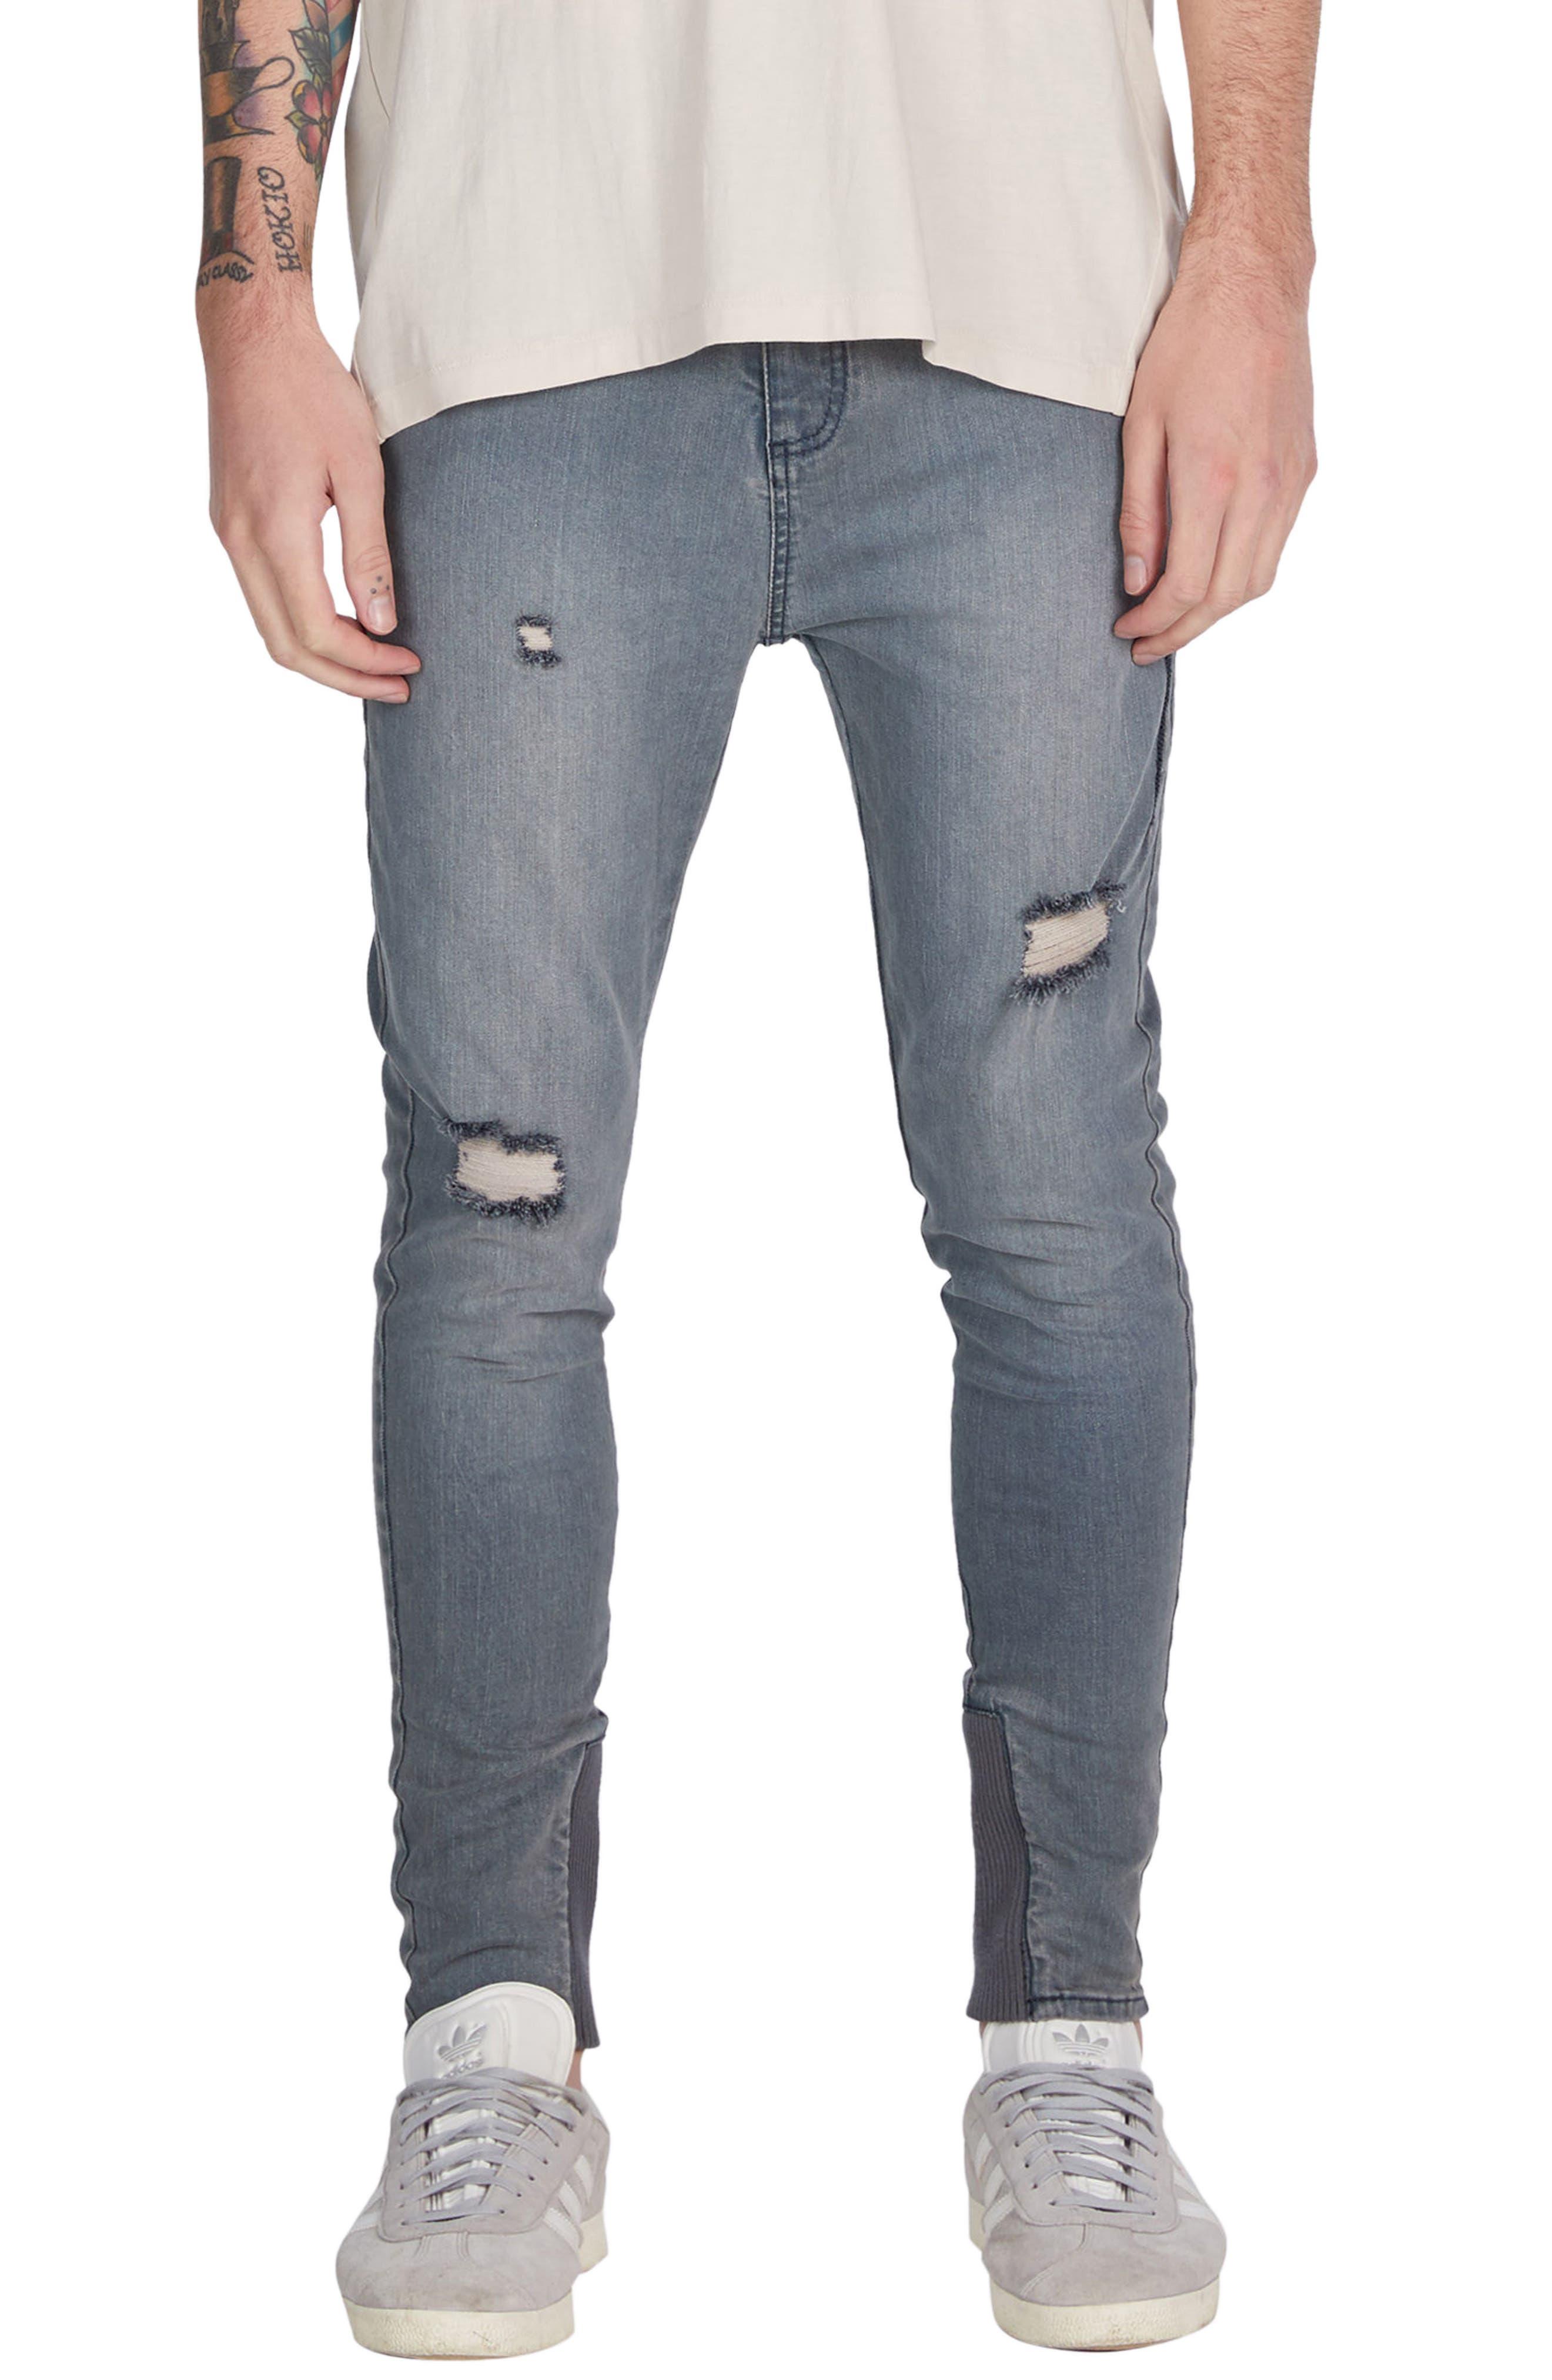 Sharpshot Slouchy Skinny Fit Denim Pants,                             Main thumbnail 1, color,                             Blue Grey